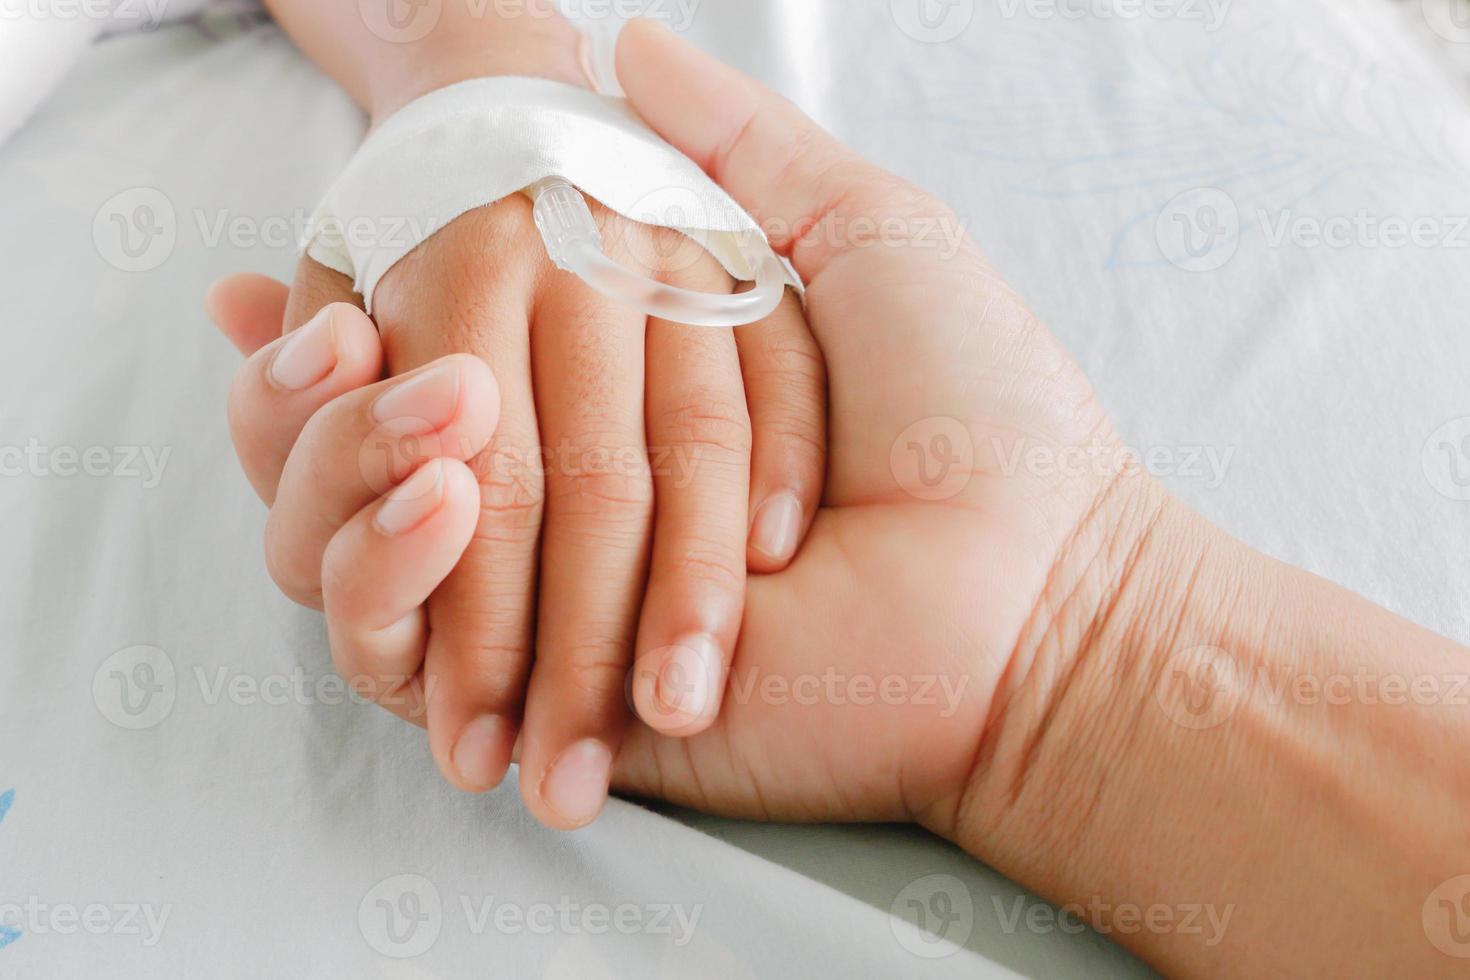 koorts patiënten foto